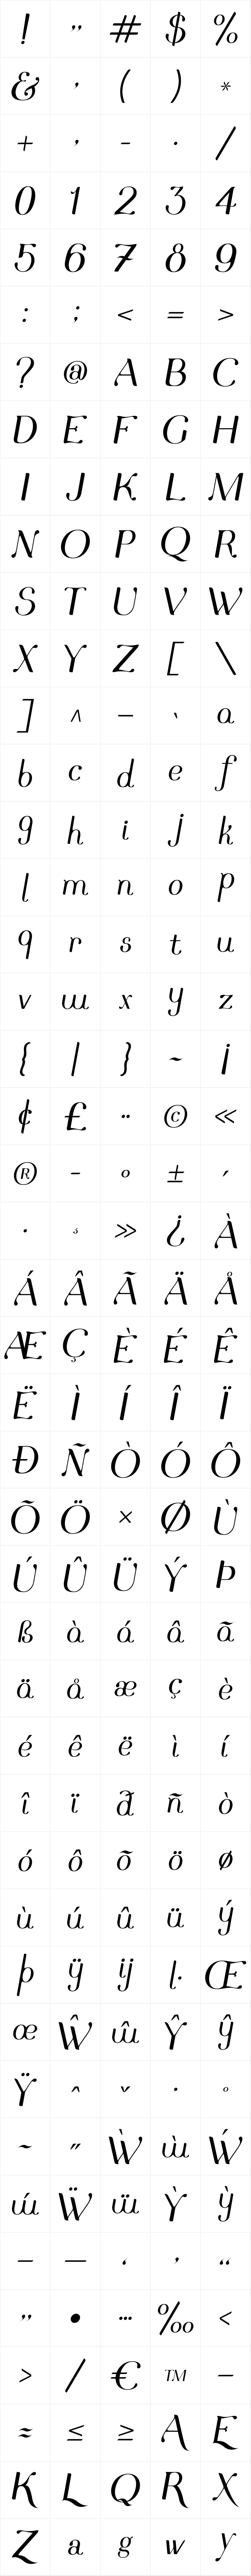 Pedrera Italic